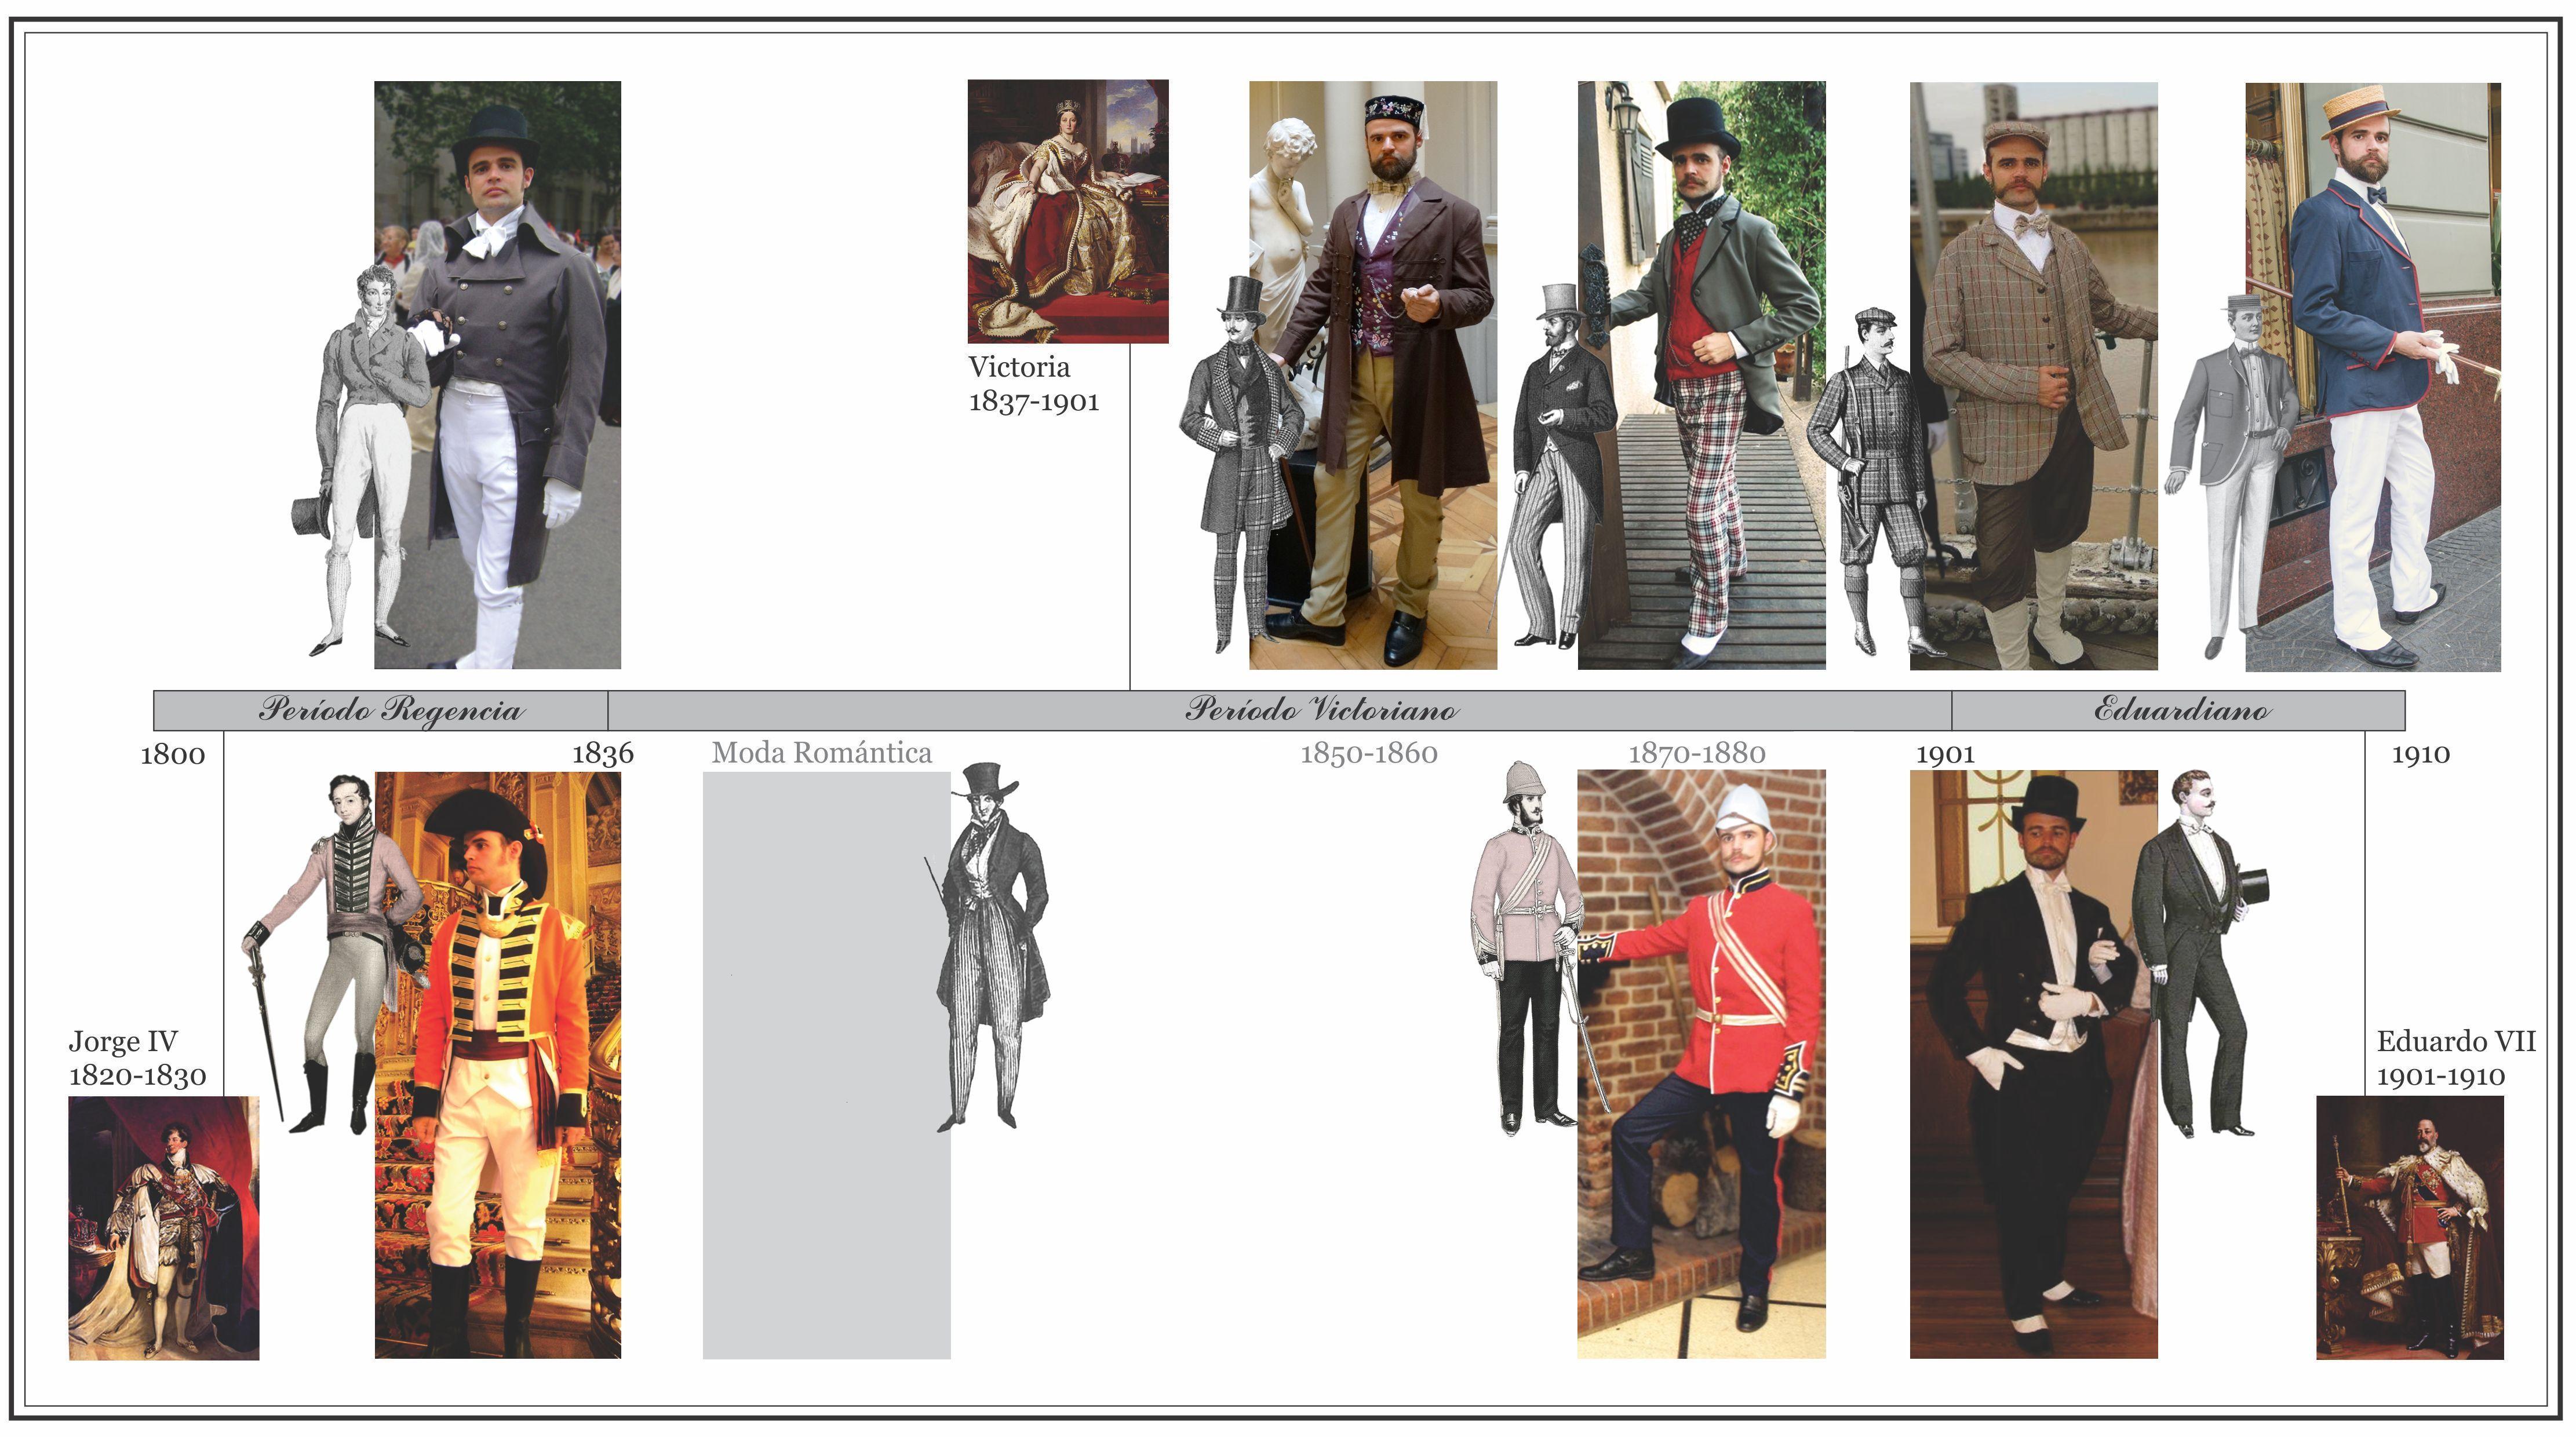 Historia de la moda masculina